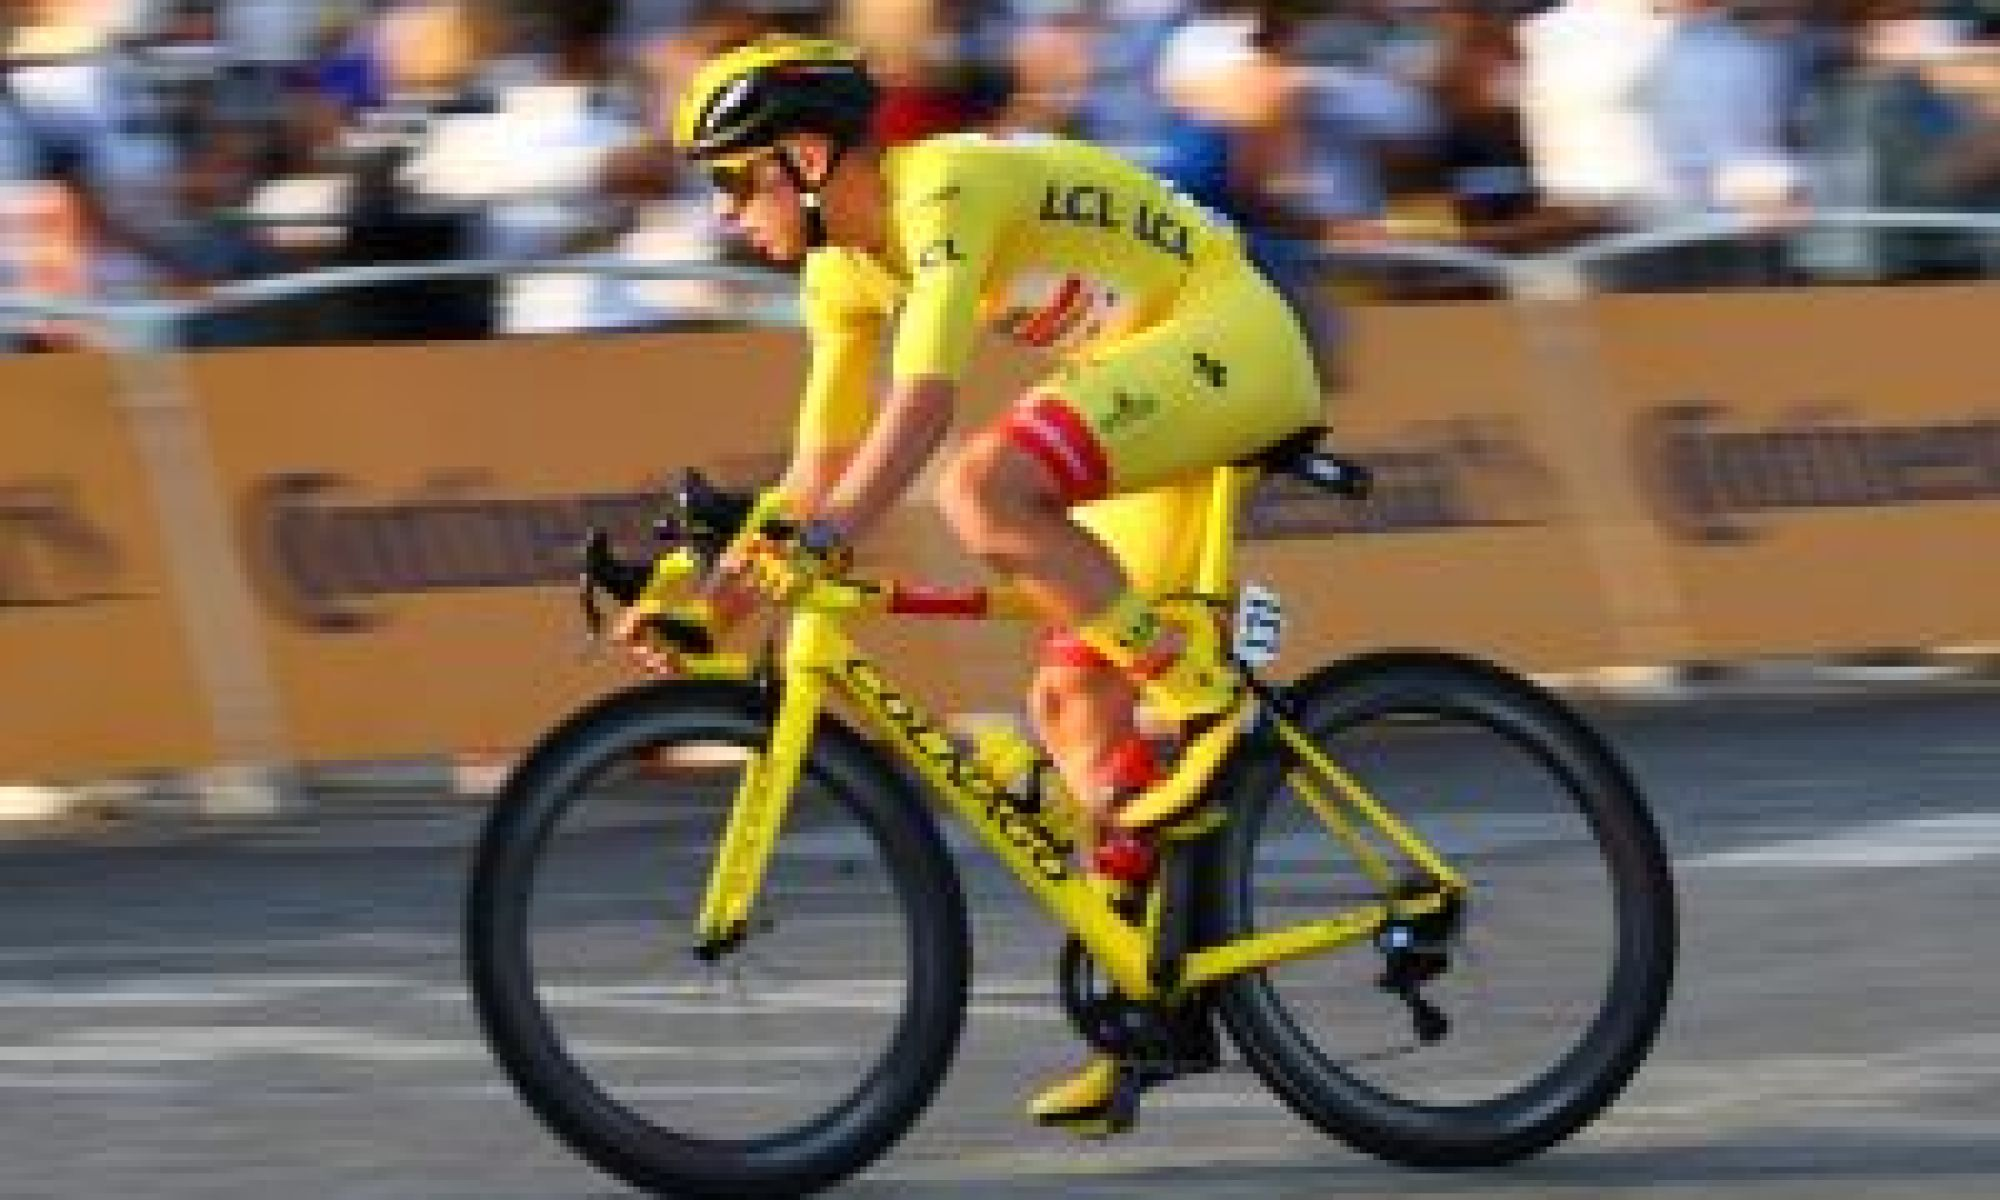 Colnago selling ,000 replica of Tadej Pogačar's Tour de France winning machine